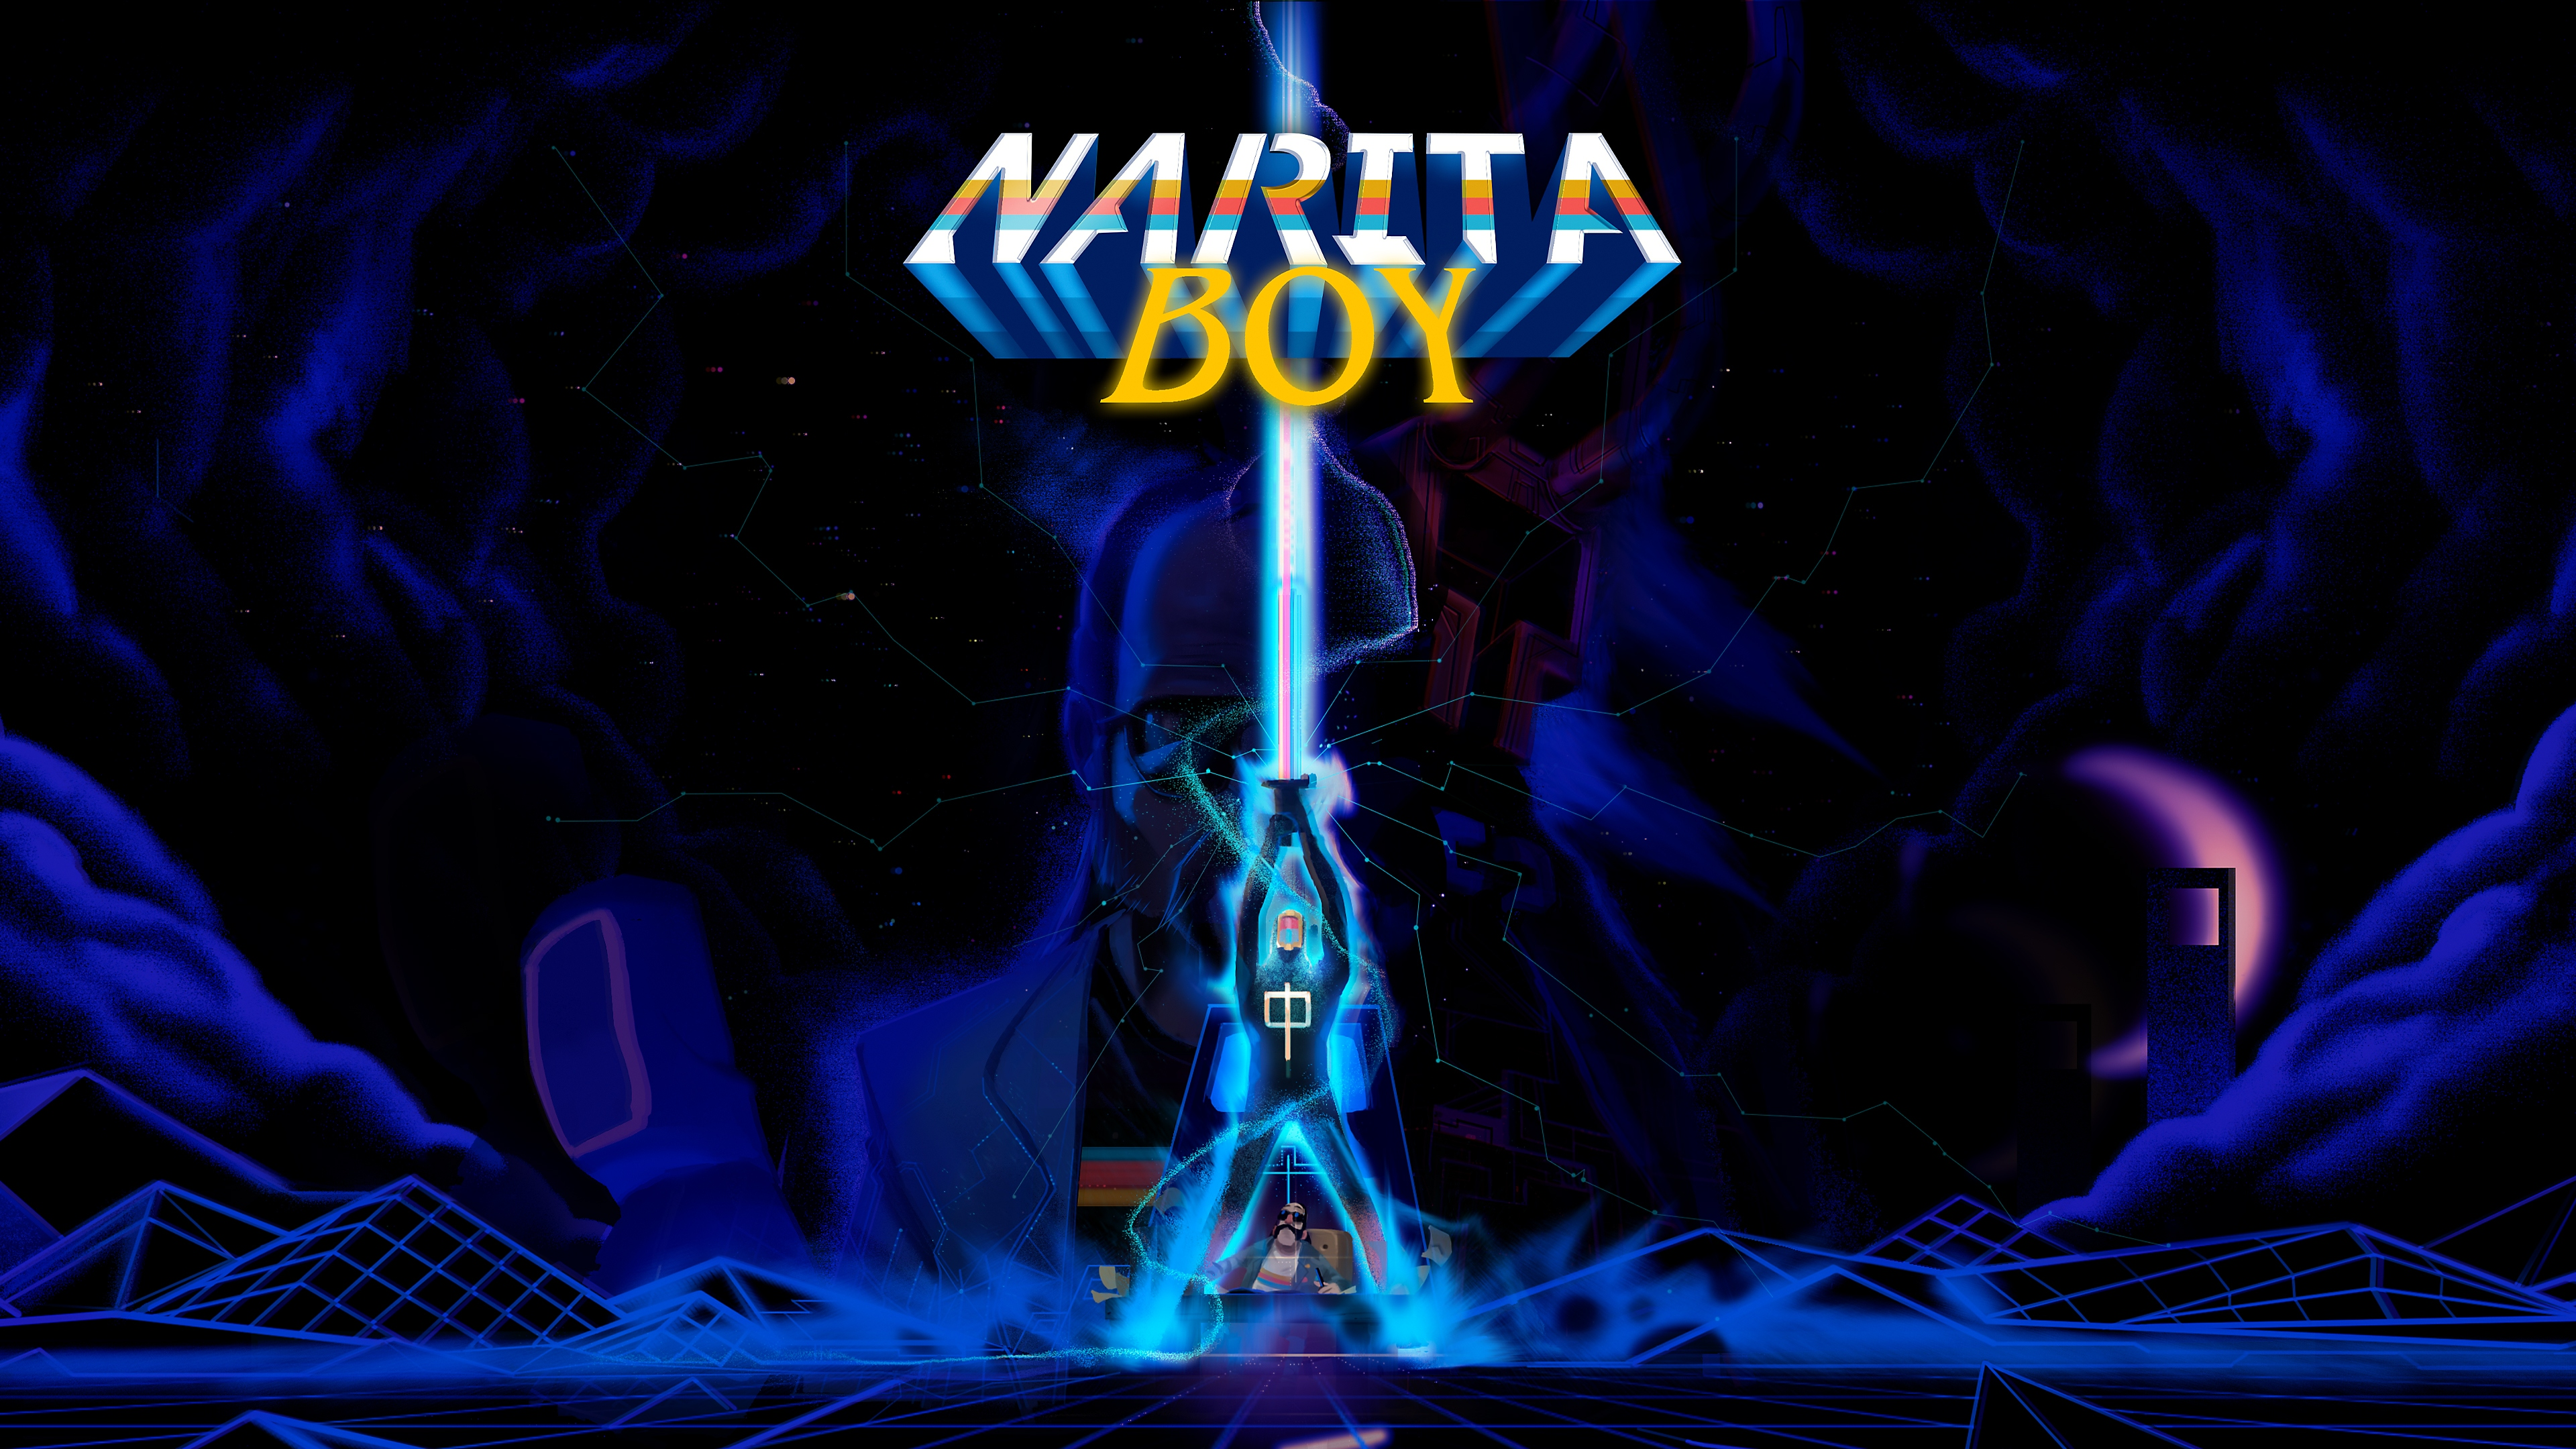 Narita Boy - Launch Trailer | PS4